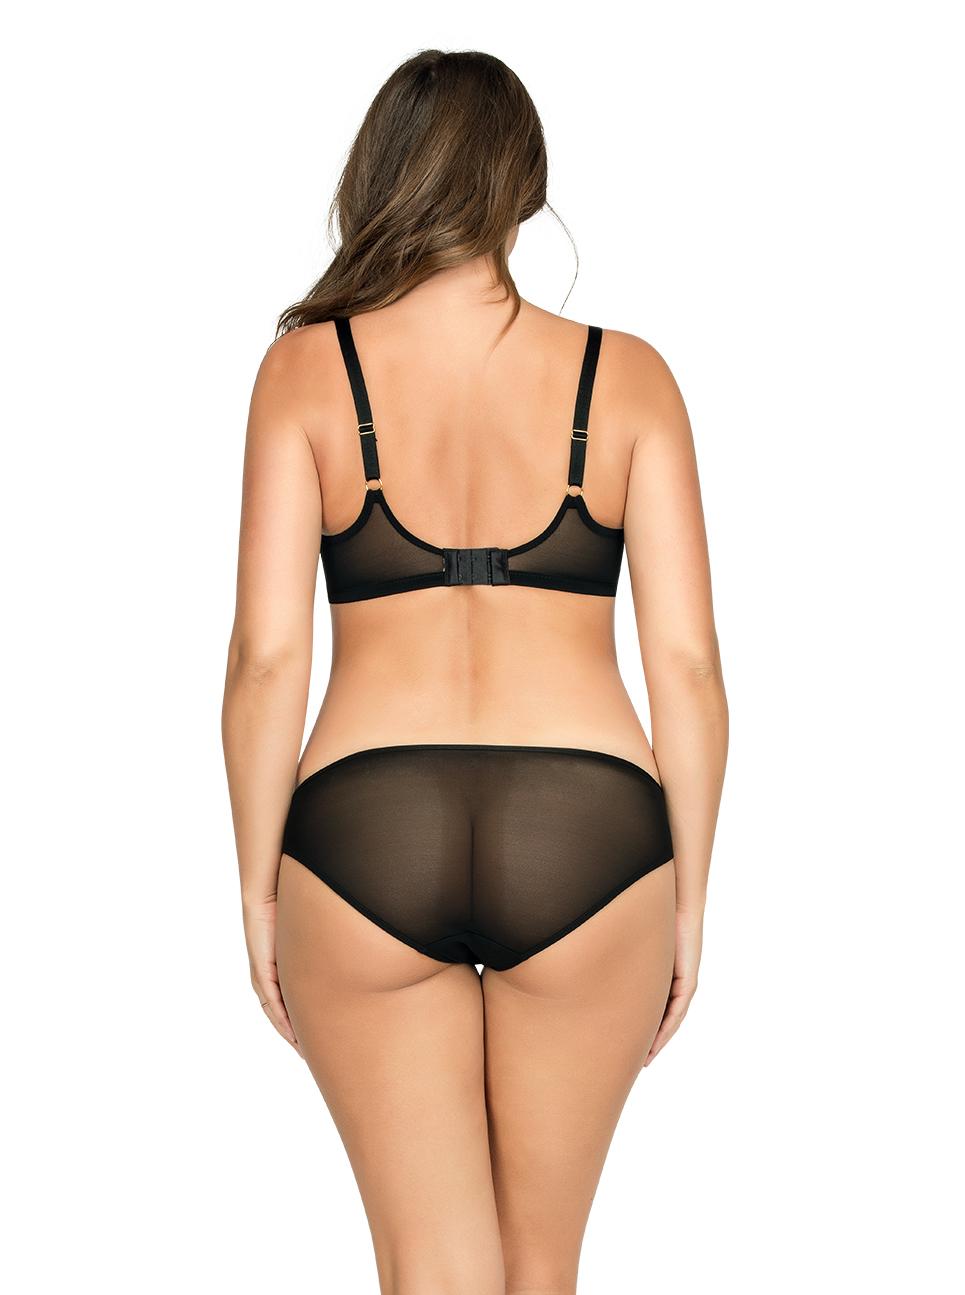 PARFAIT Briana PaddedBraP5671 BikiniP5673 BlackFloral Back - Briana Bikini Black Floral P5673